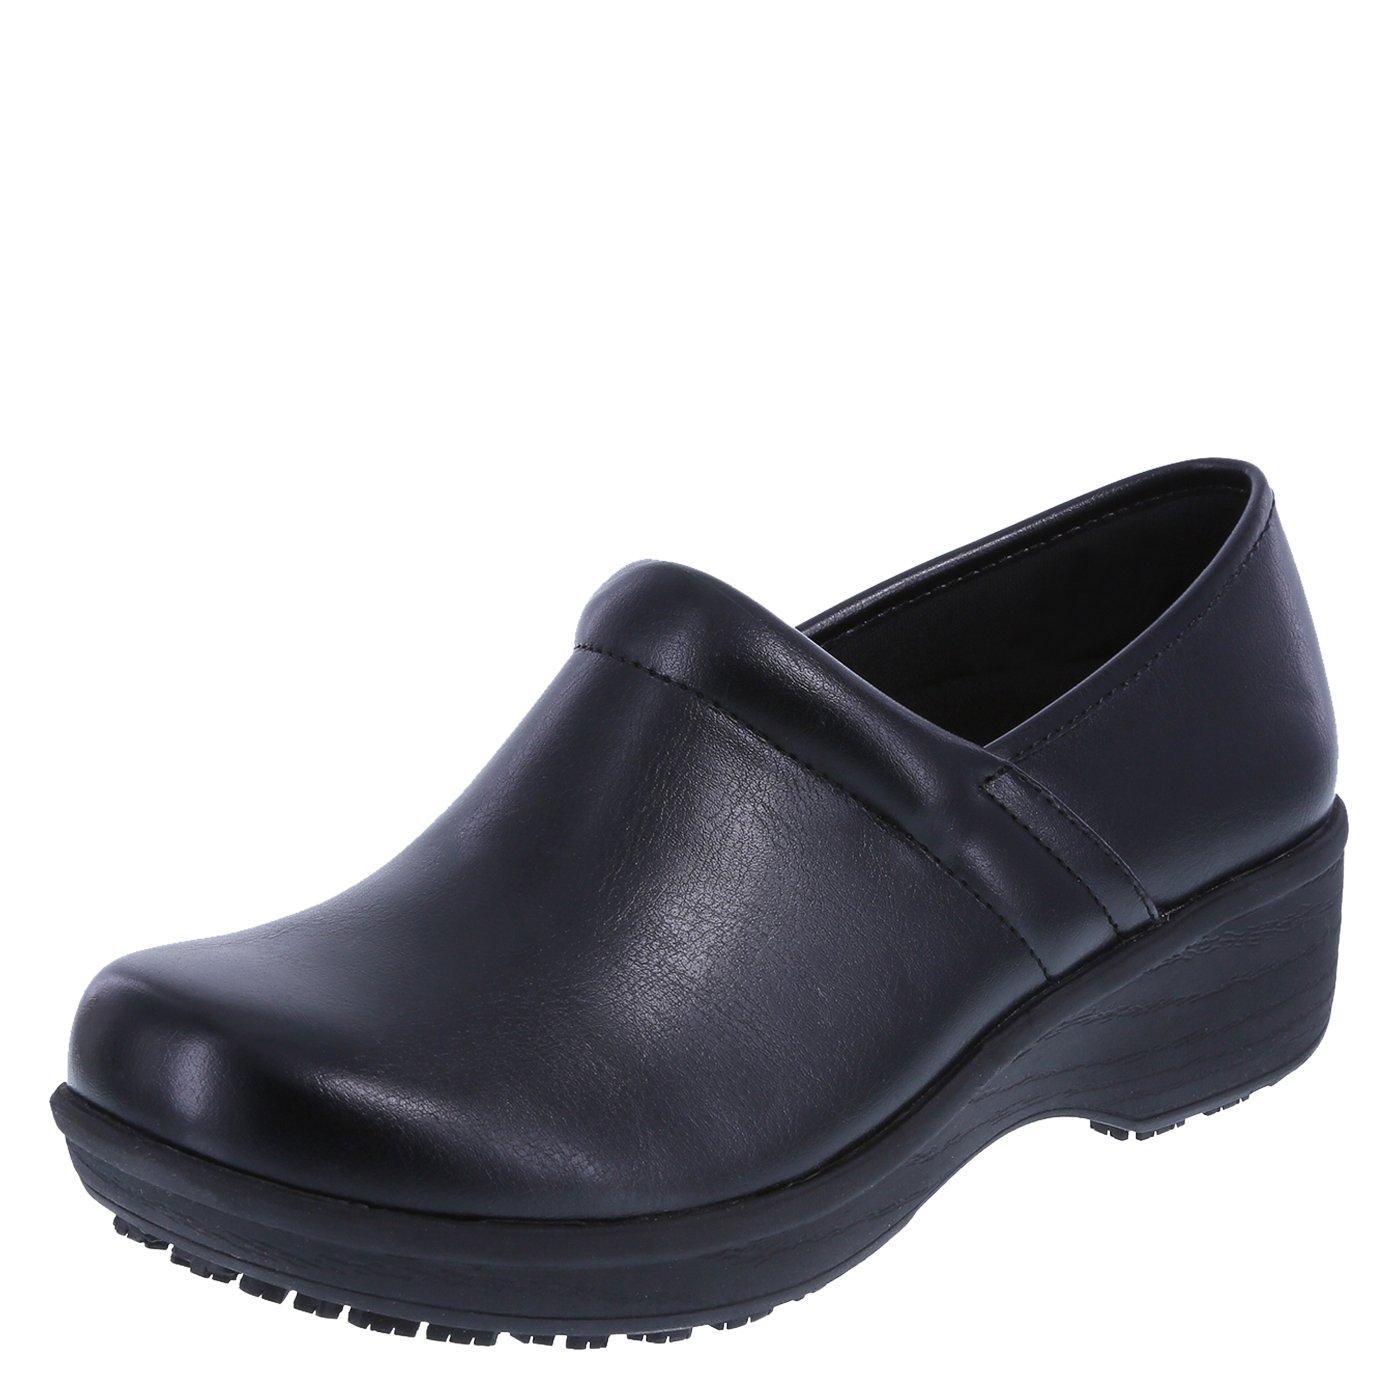 safeTstep Slip Resistant Women's Black Women's Gretchen Clog 6 Wide